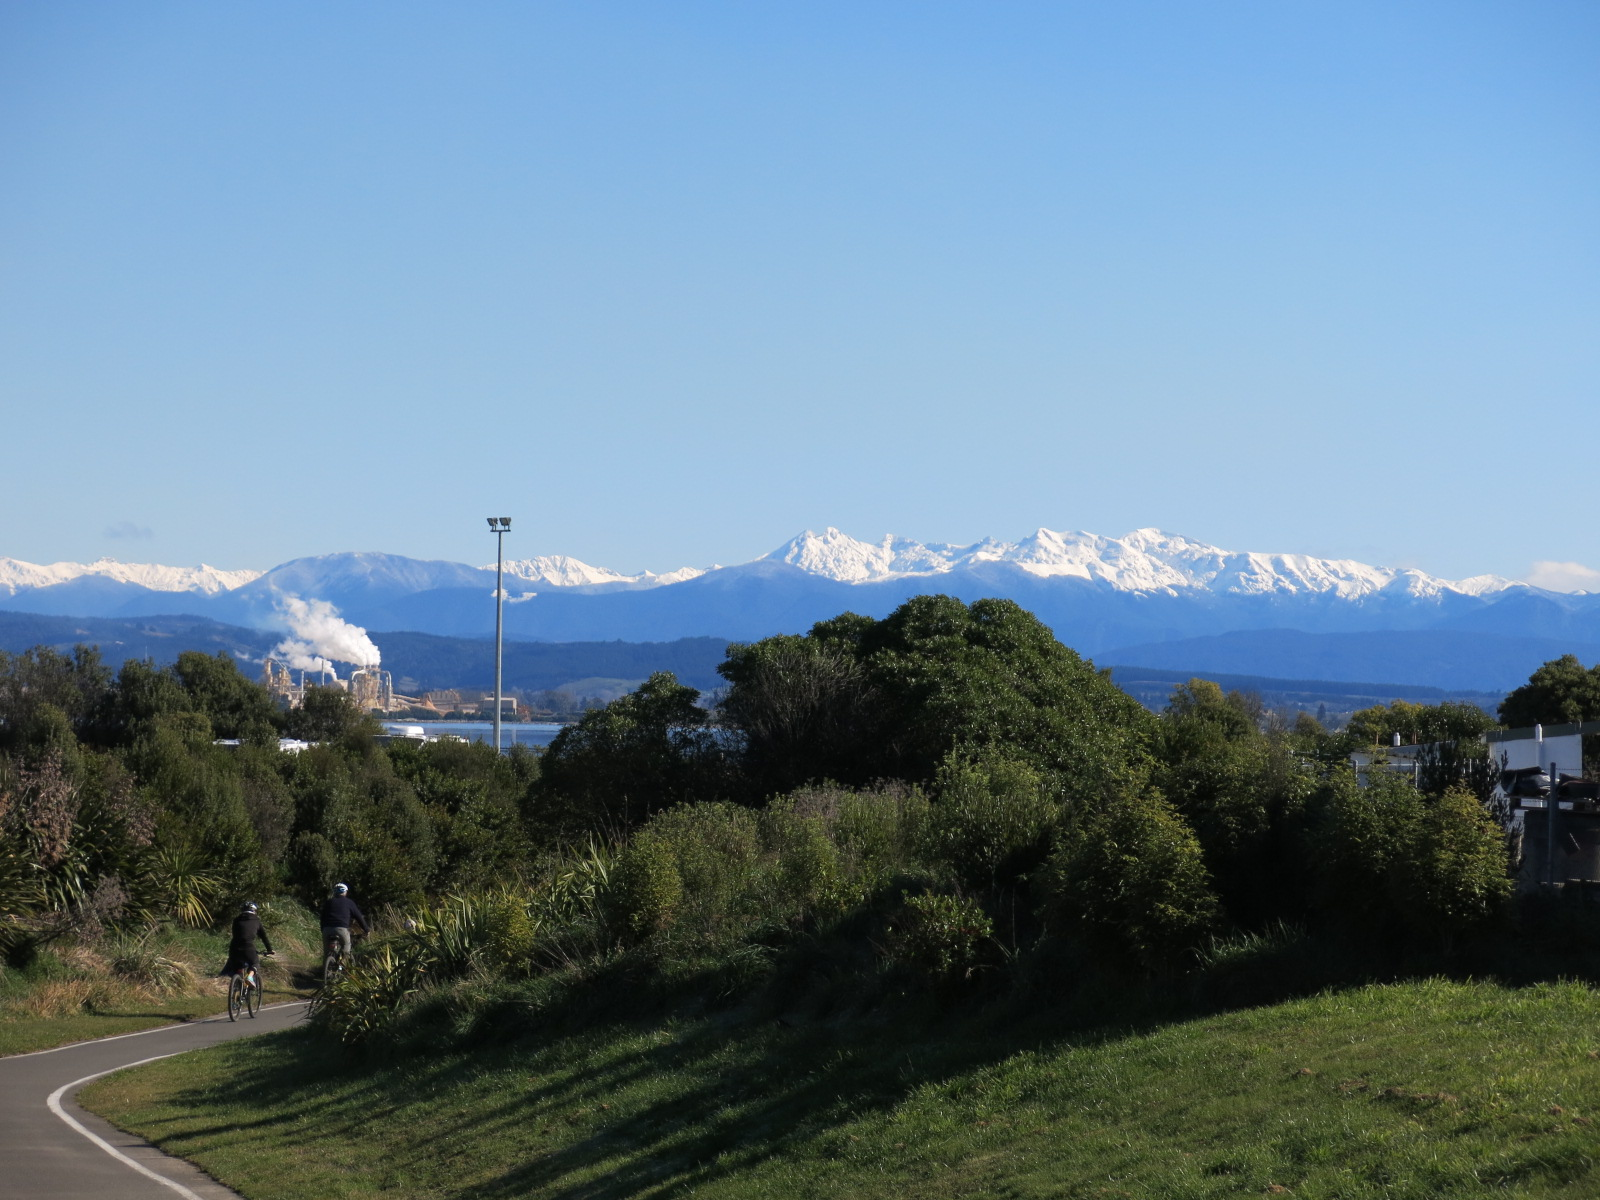 Railway Reserveから山を望む